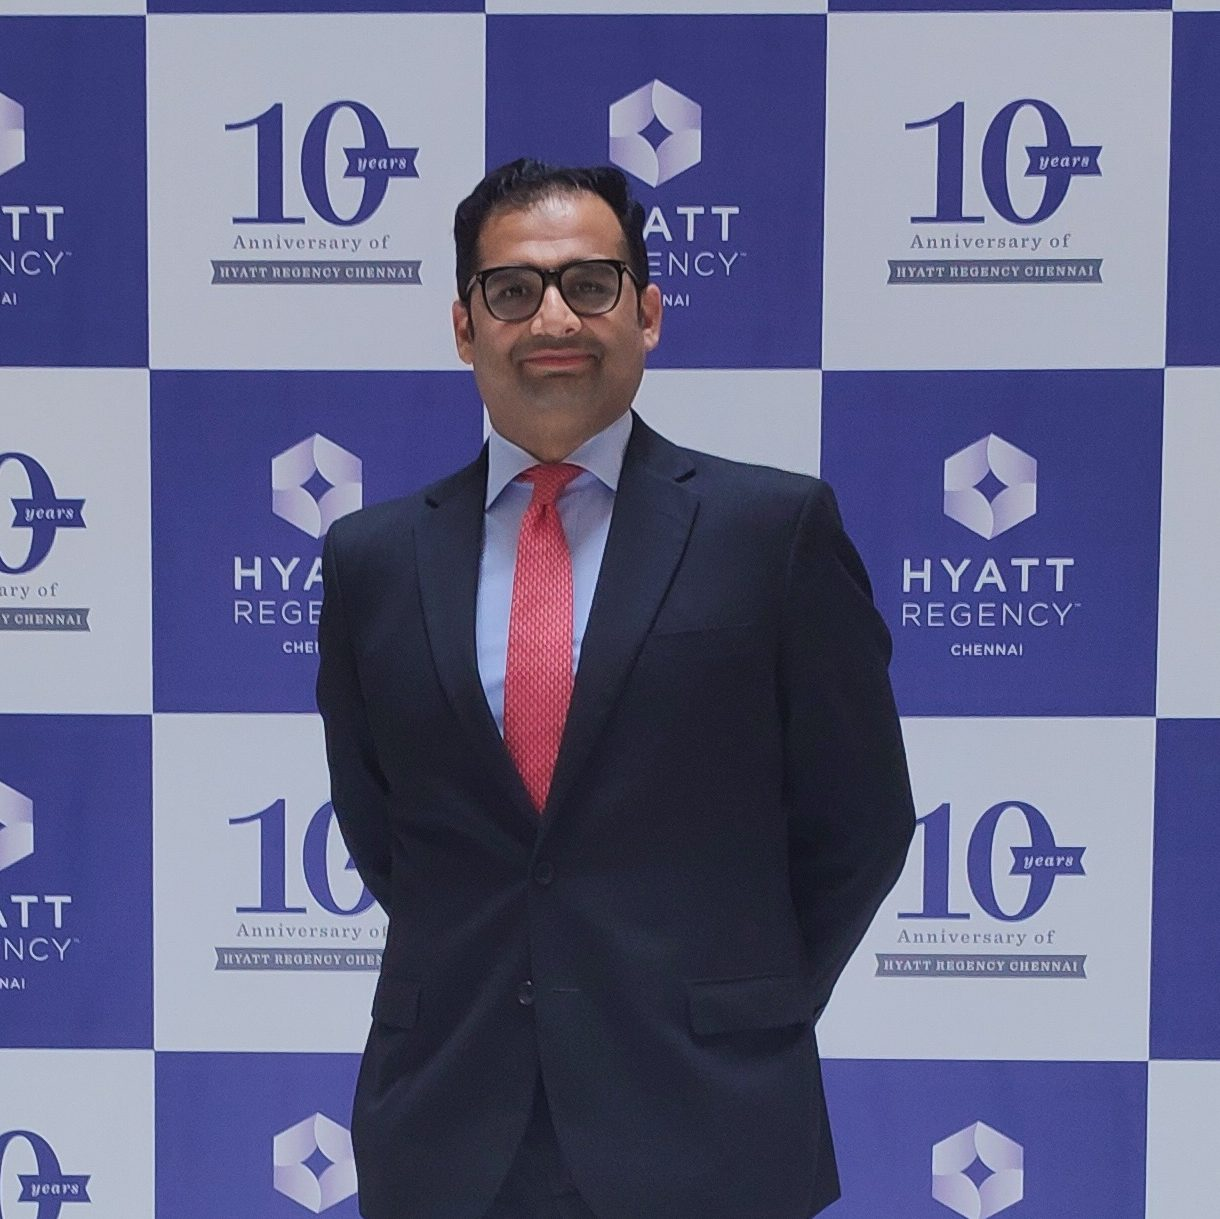 Tarun Seth, General Manager, Hyatt Regency Chennai